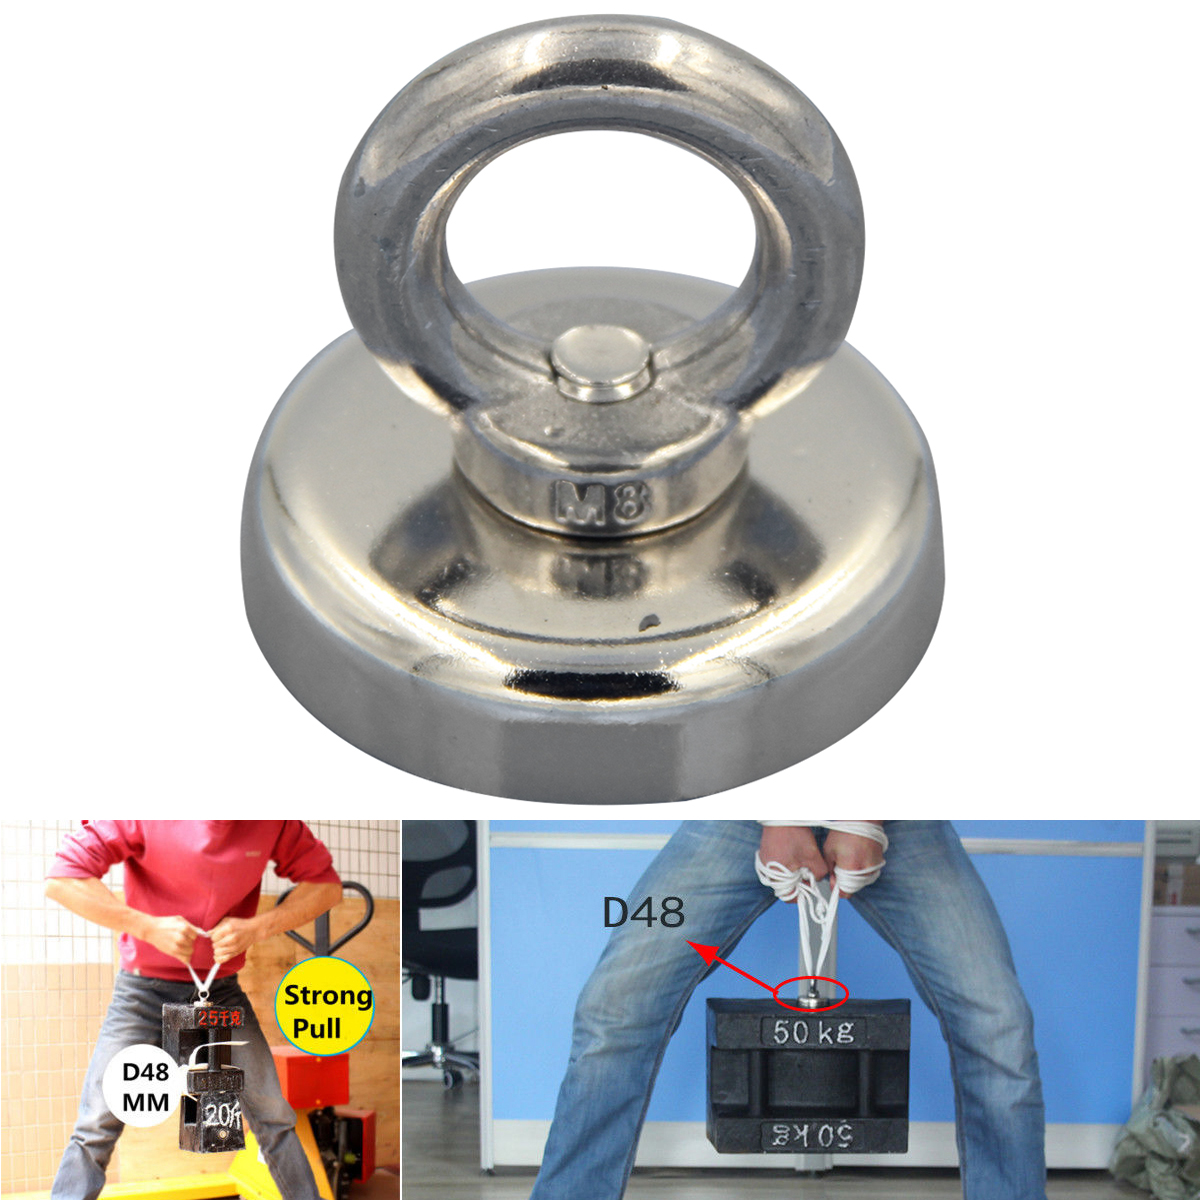 Strong Salvage  Recovery Magnet Neodymium with Eyebolt Circular Ring 48x52mm 66Kg vitagel восстановление recovery купить тюмень